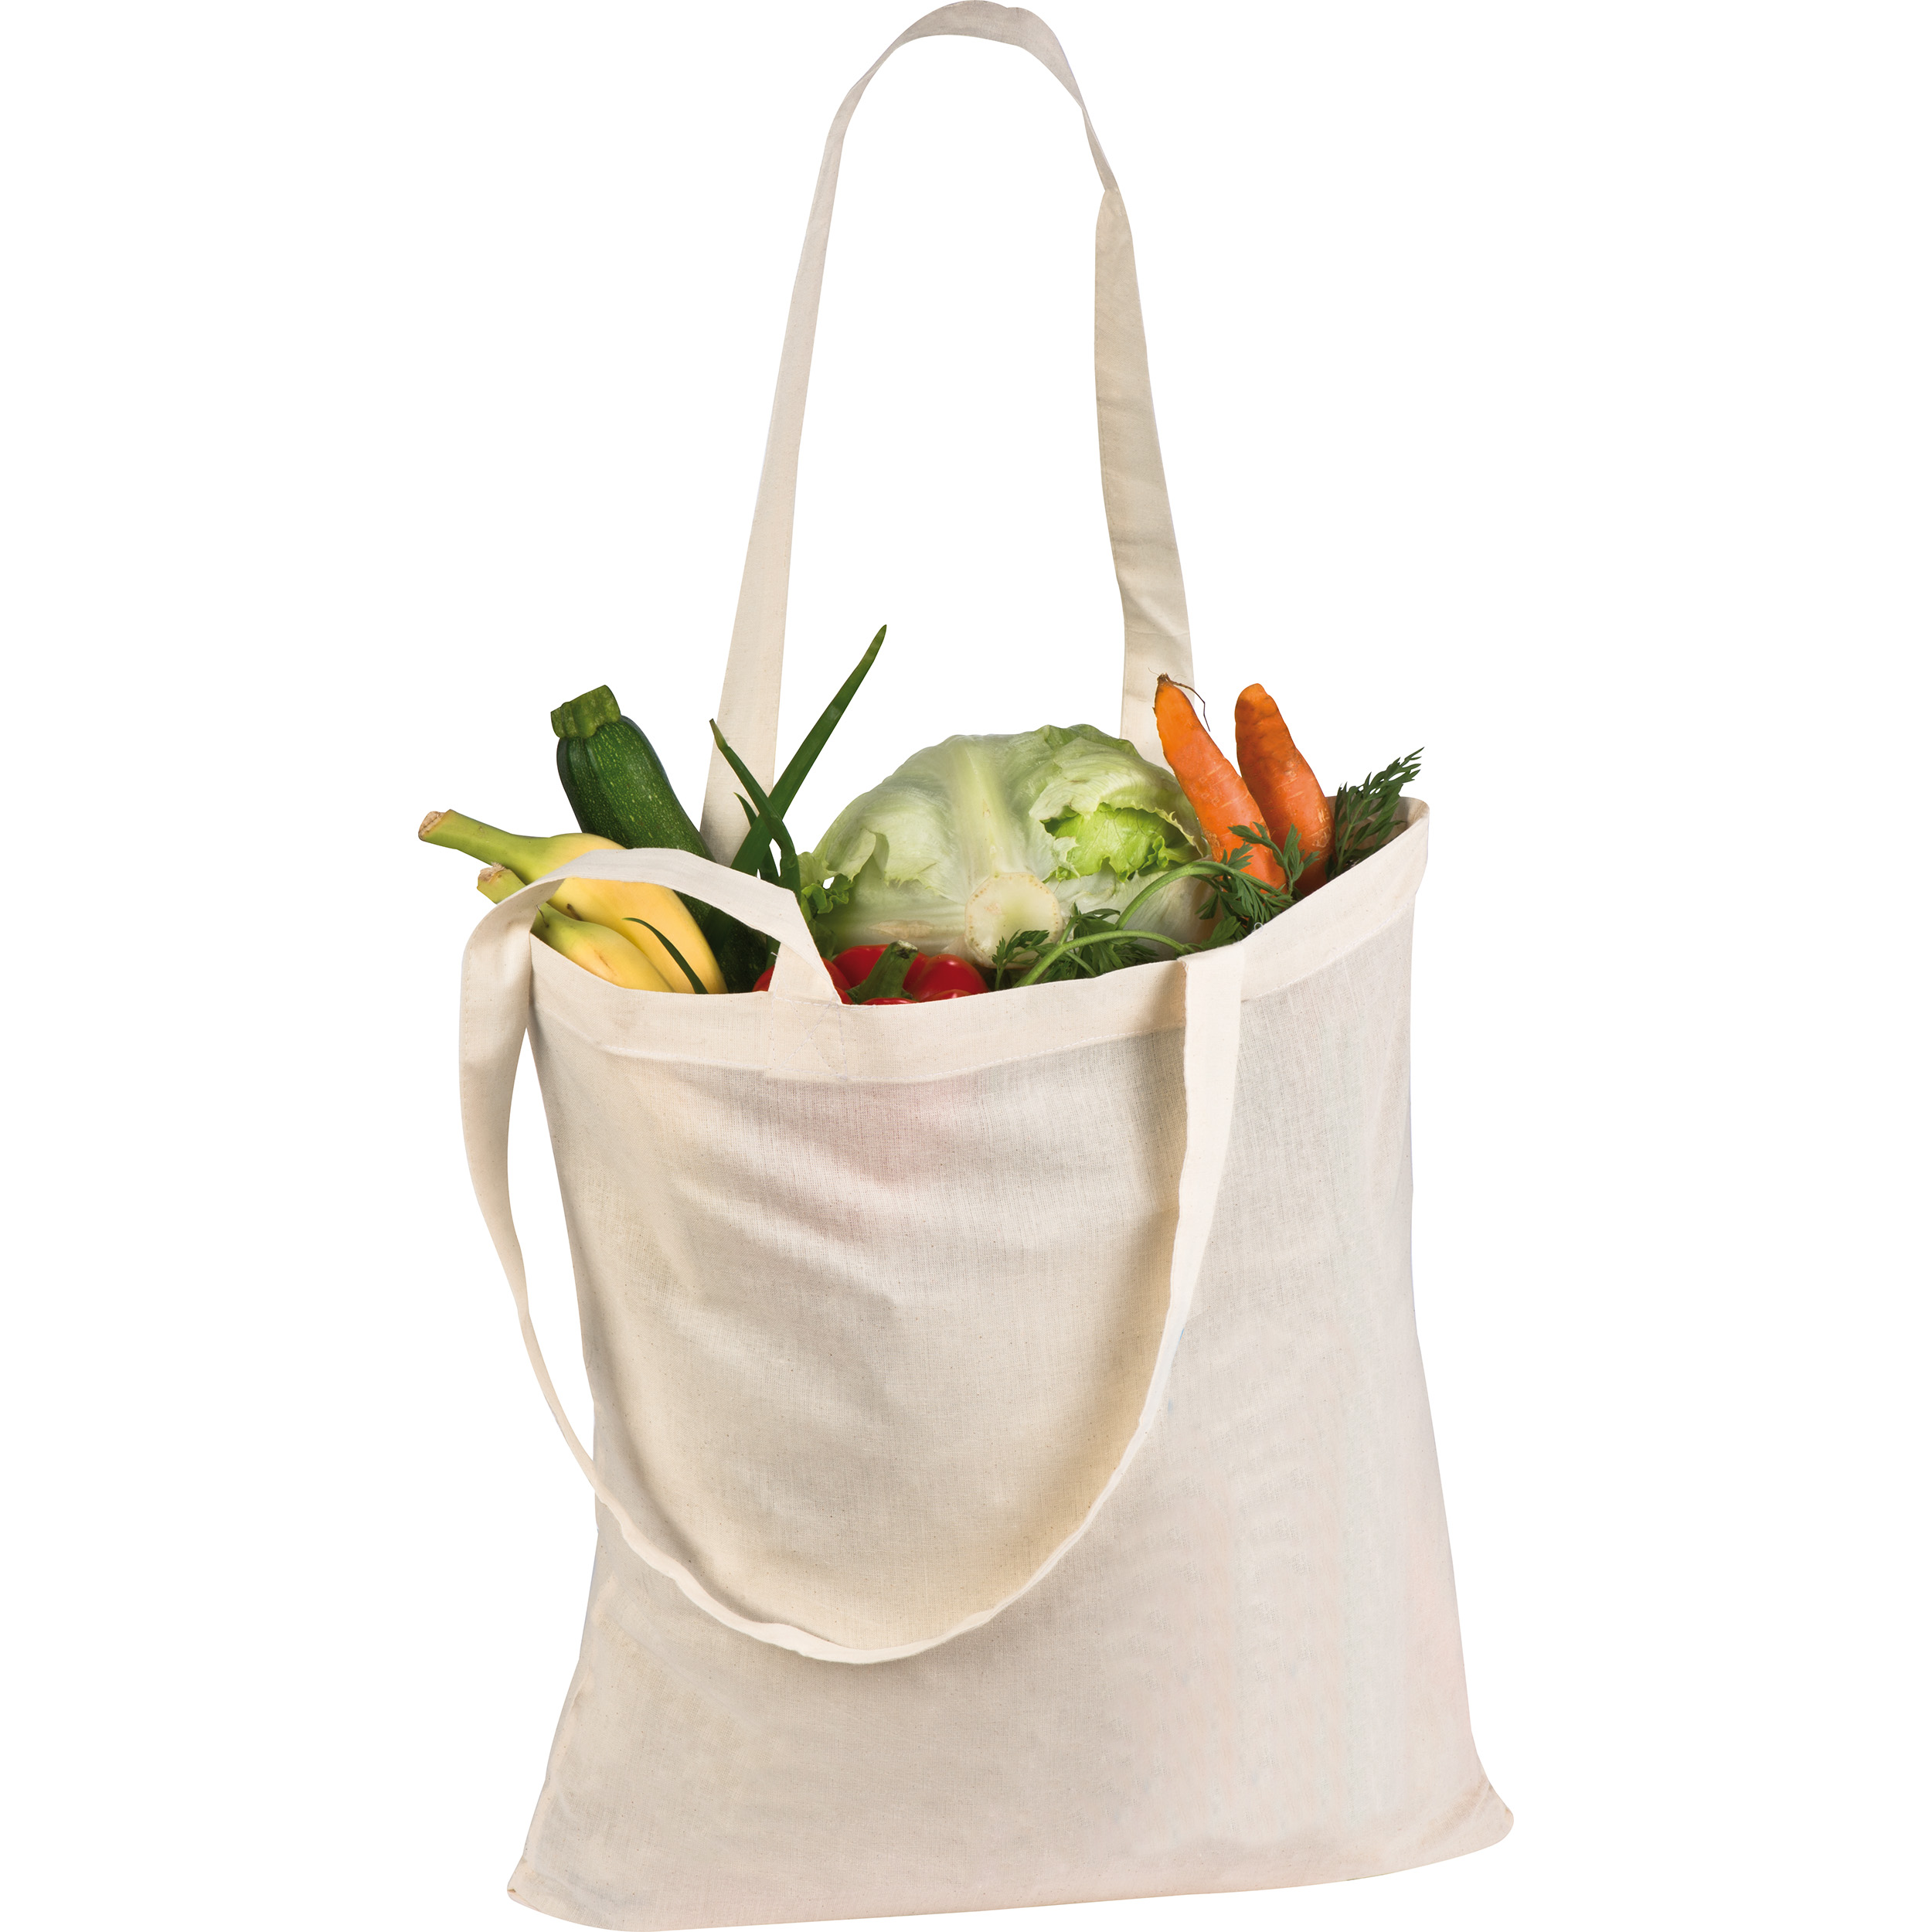 Long-handled shopping bag